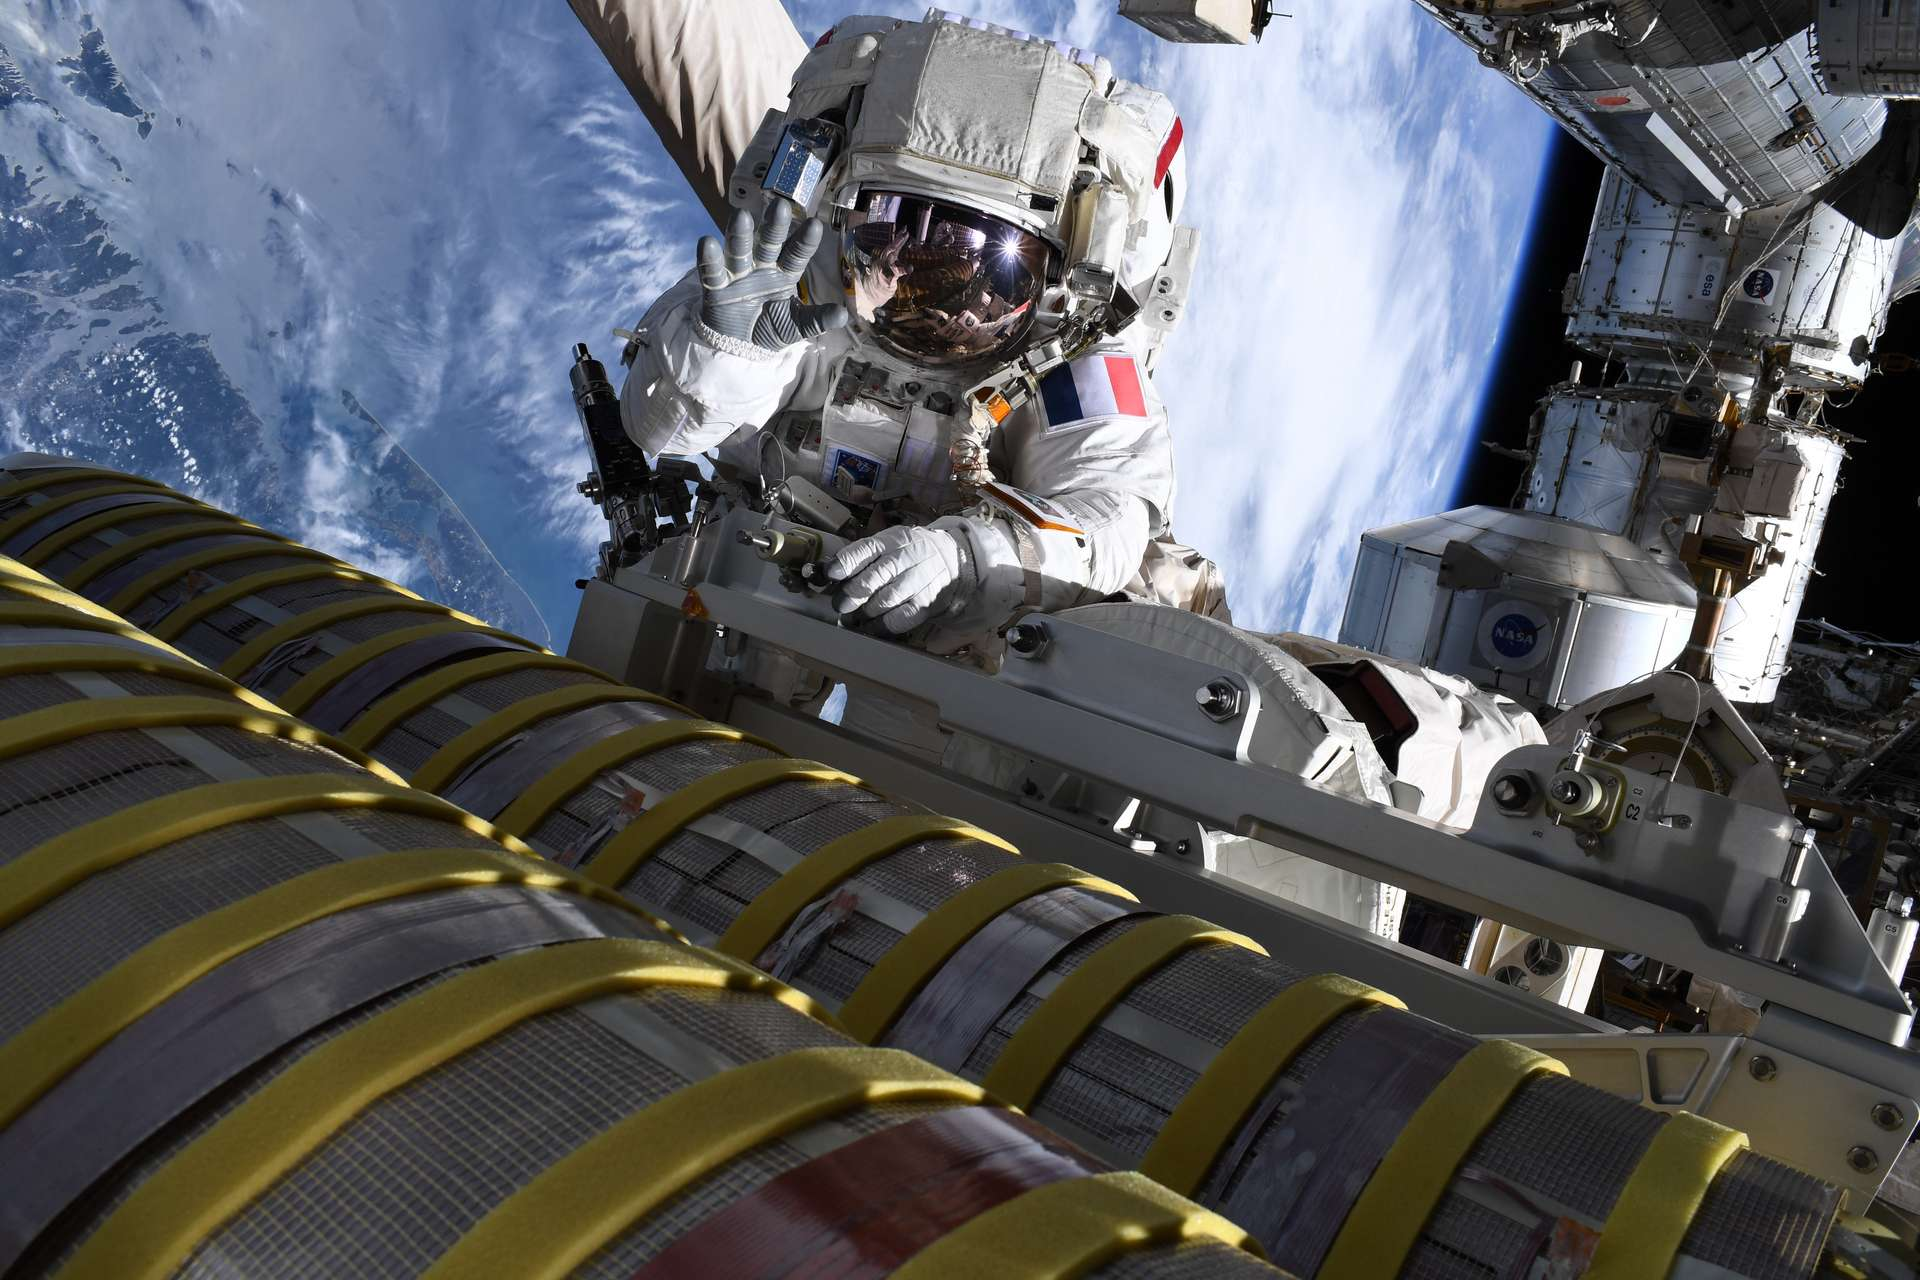 Thomas Pesquet lors de sa sortie extravéhiculaire du 20 juin 2021. © Nasa, S. Kimbrough